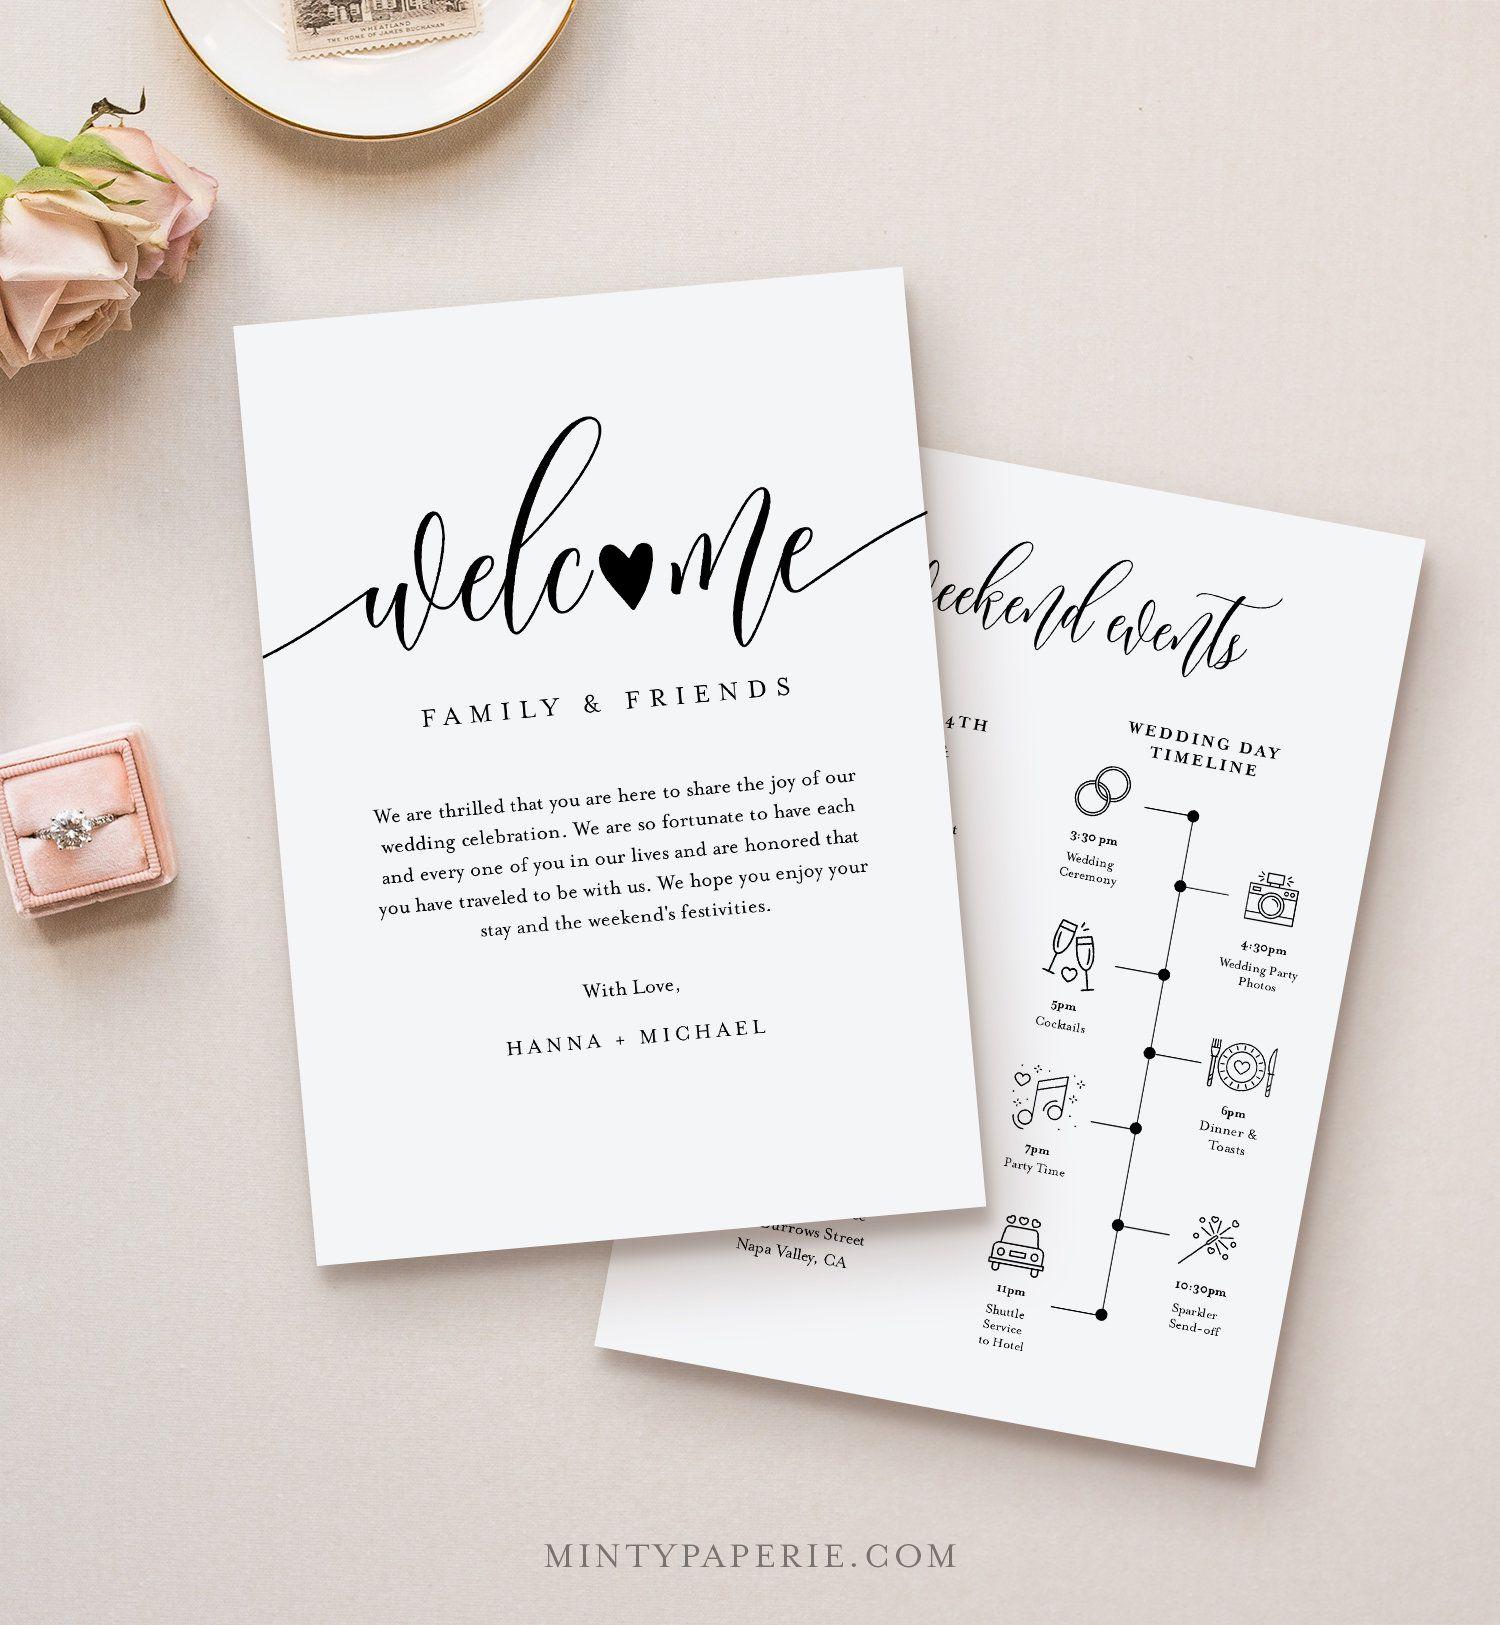 009 Stunning Wedding Gift Bag Welcome Letter Template. Highest Quality Full